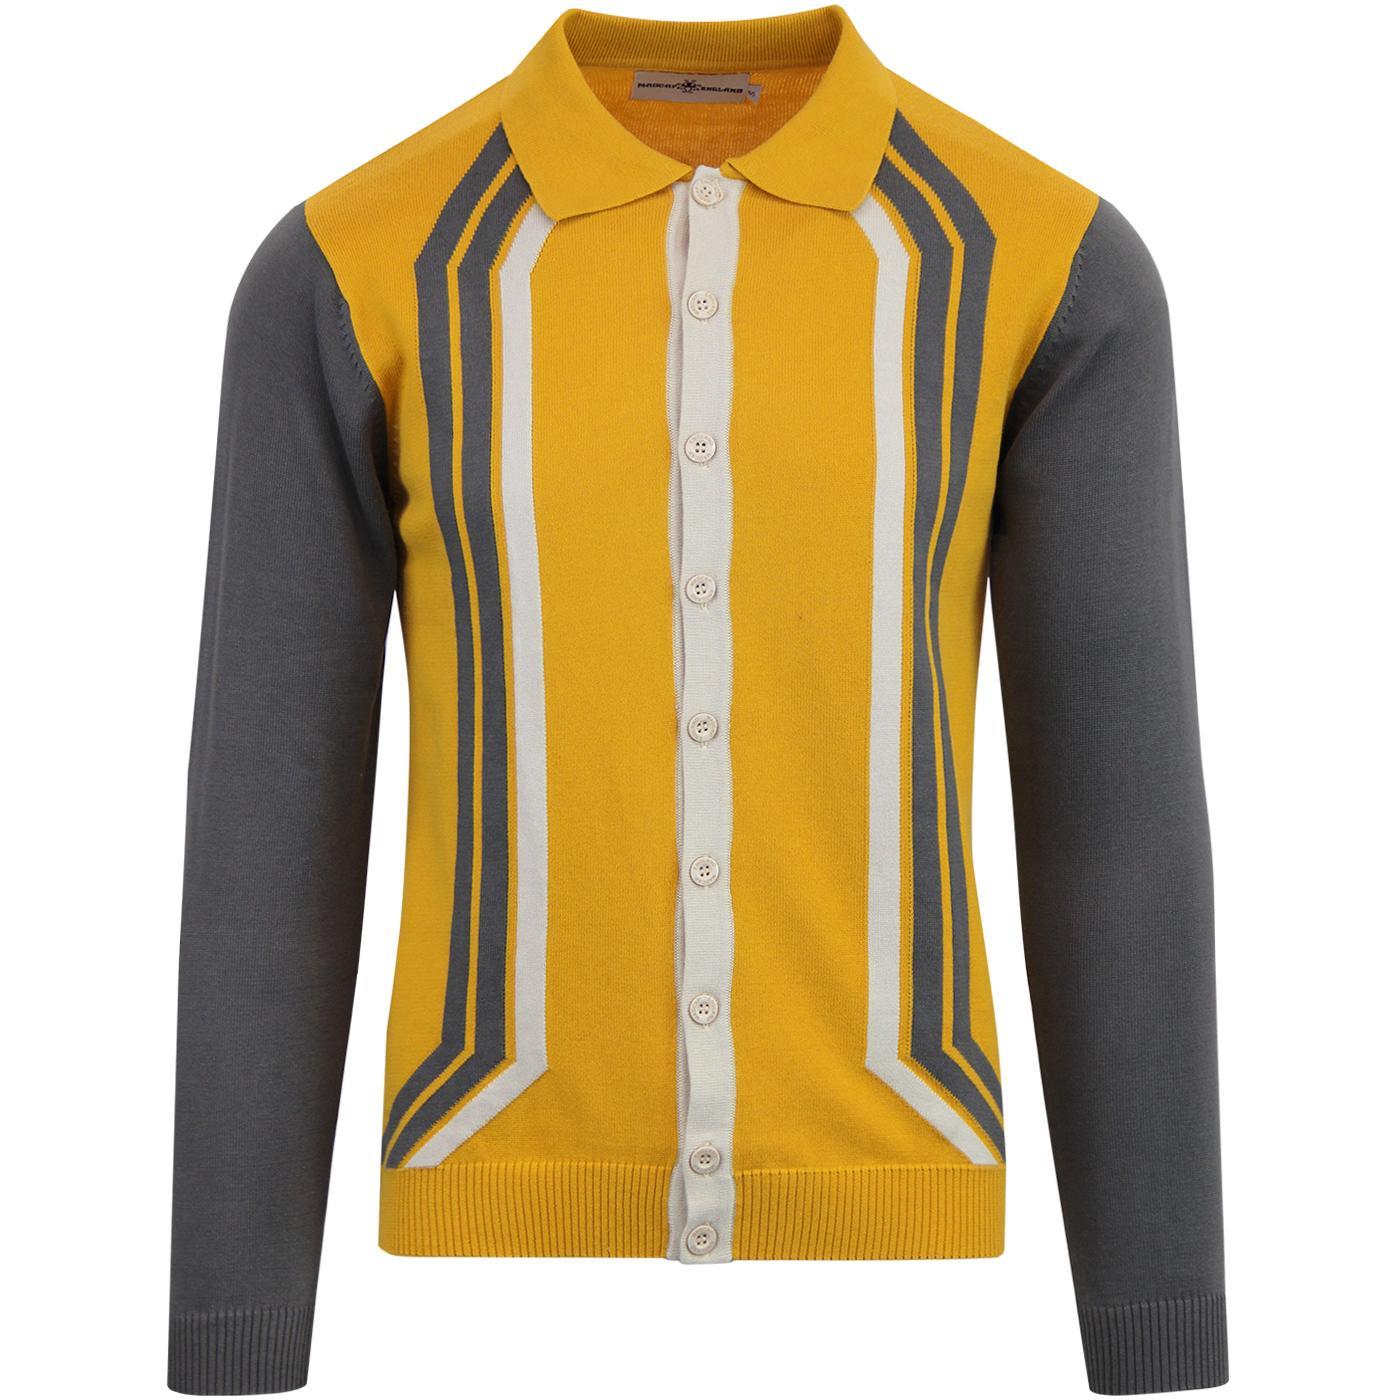 Sunny MADCAP ENGLAND Mod Stripe Knit Polo Cardigan